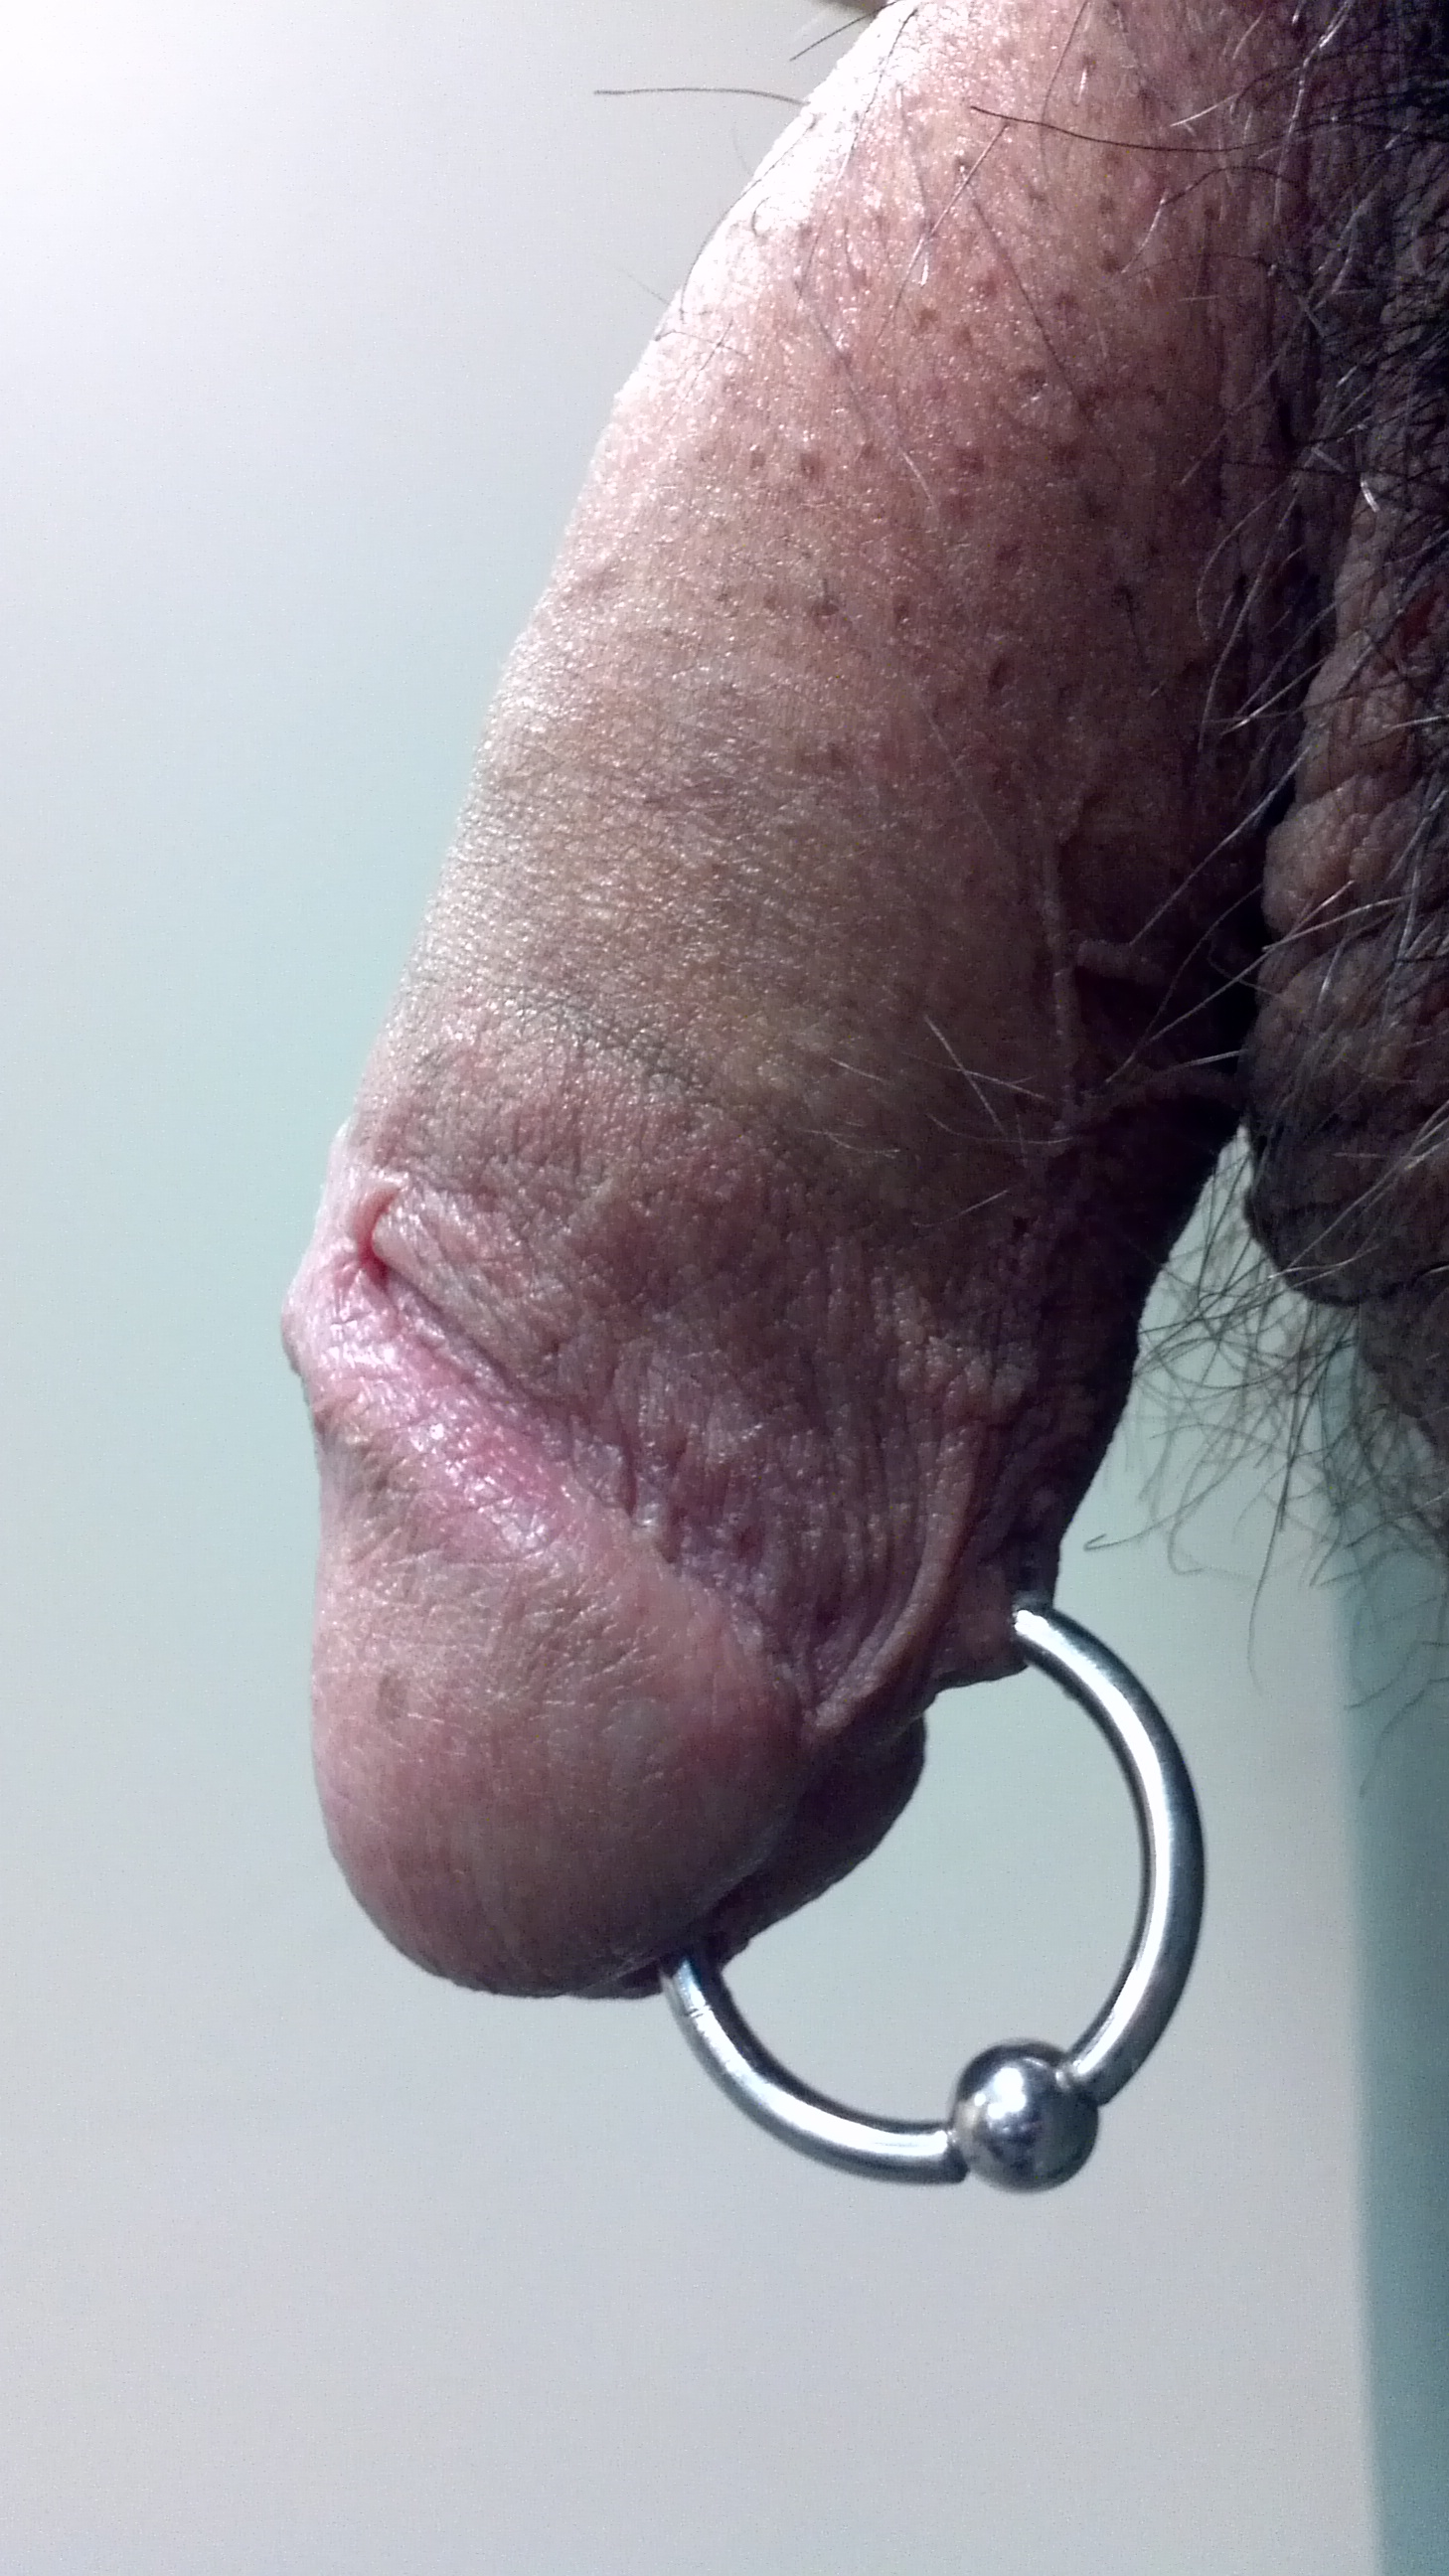 prince albert piercing